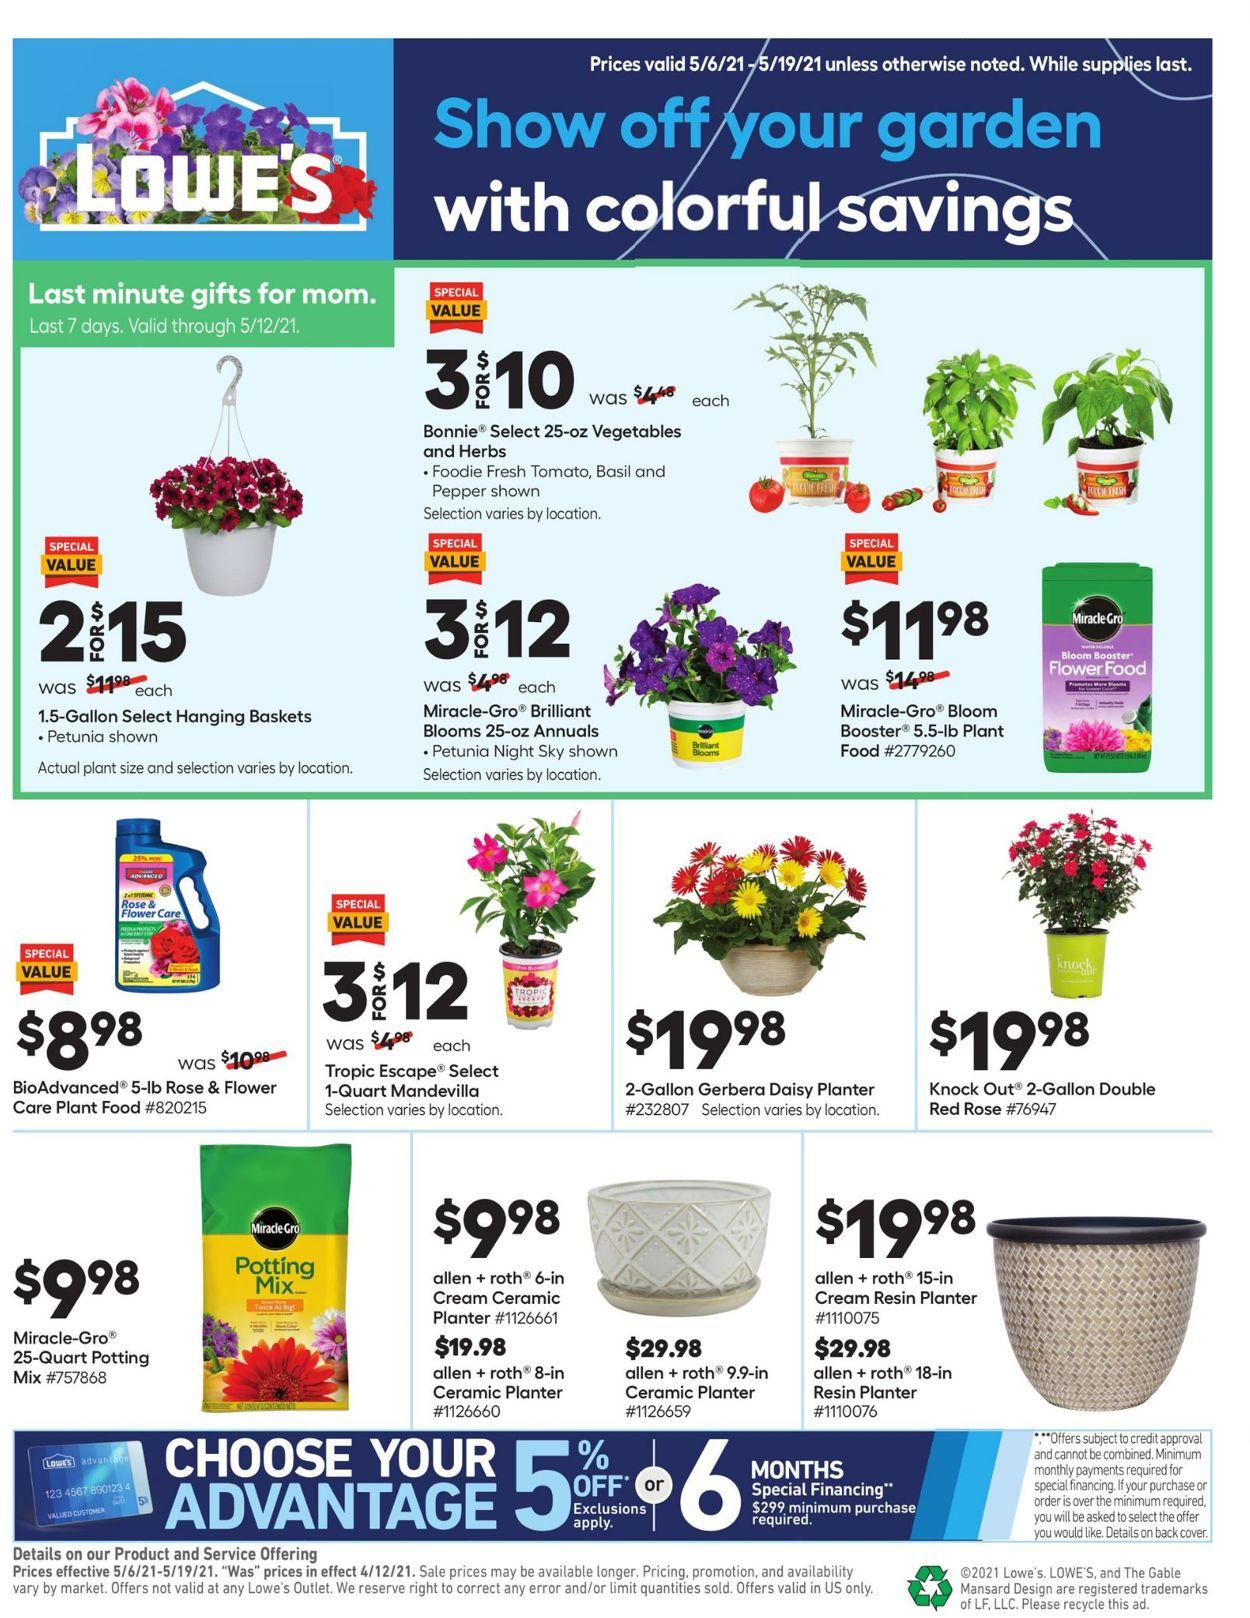 Lowe's Weekly Ad Circular - valid 05/06-05/19/2021